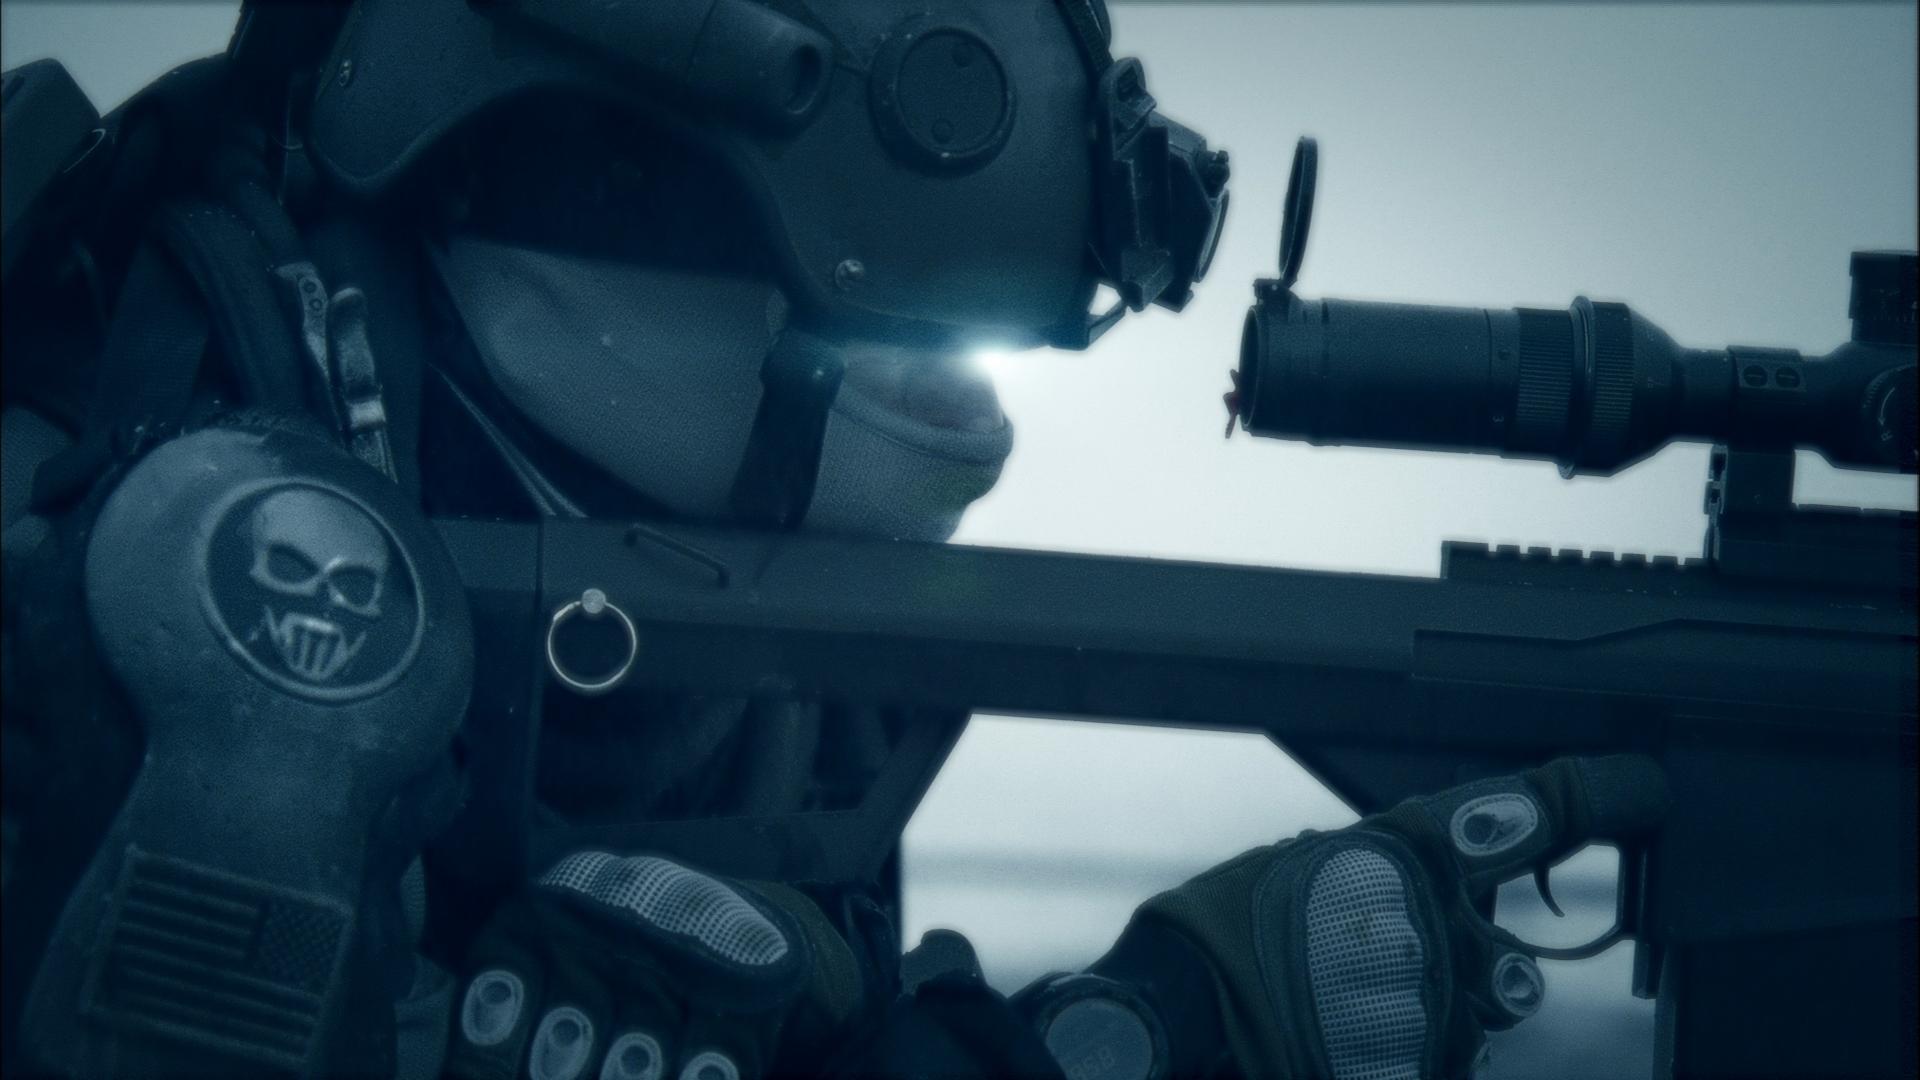 Call Of Duty Modern Warfare 3 Soldier Automatic